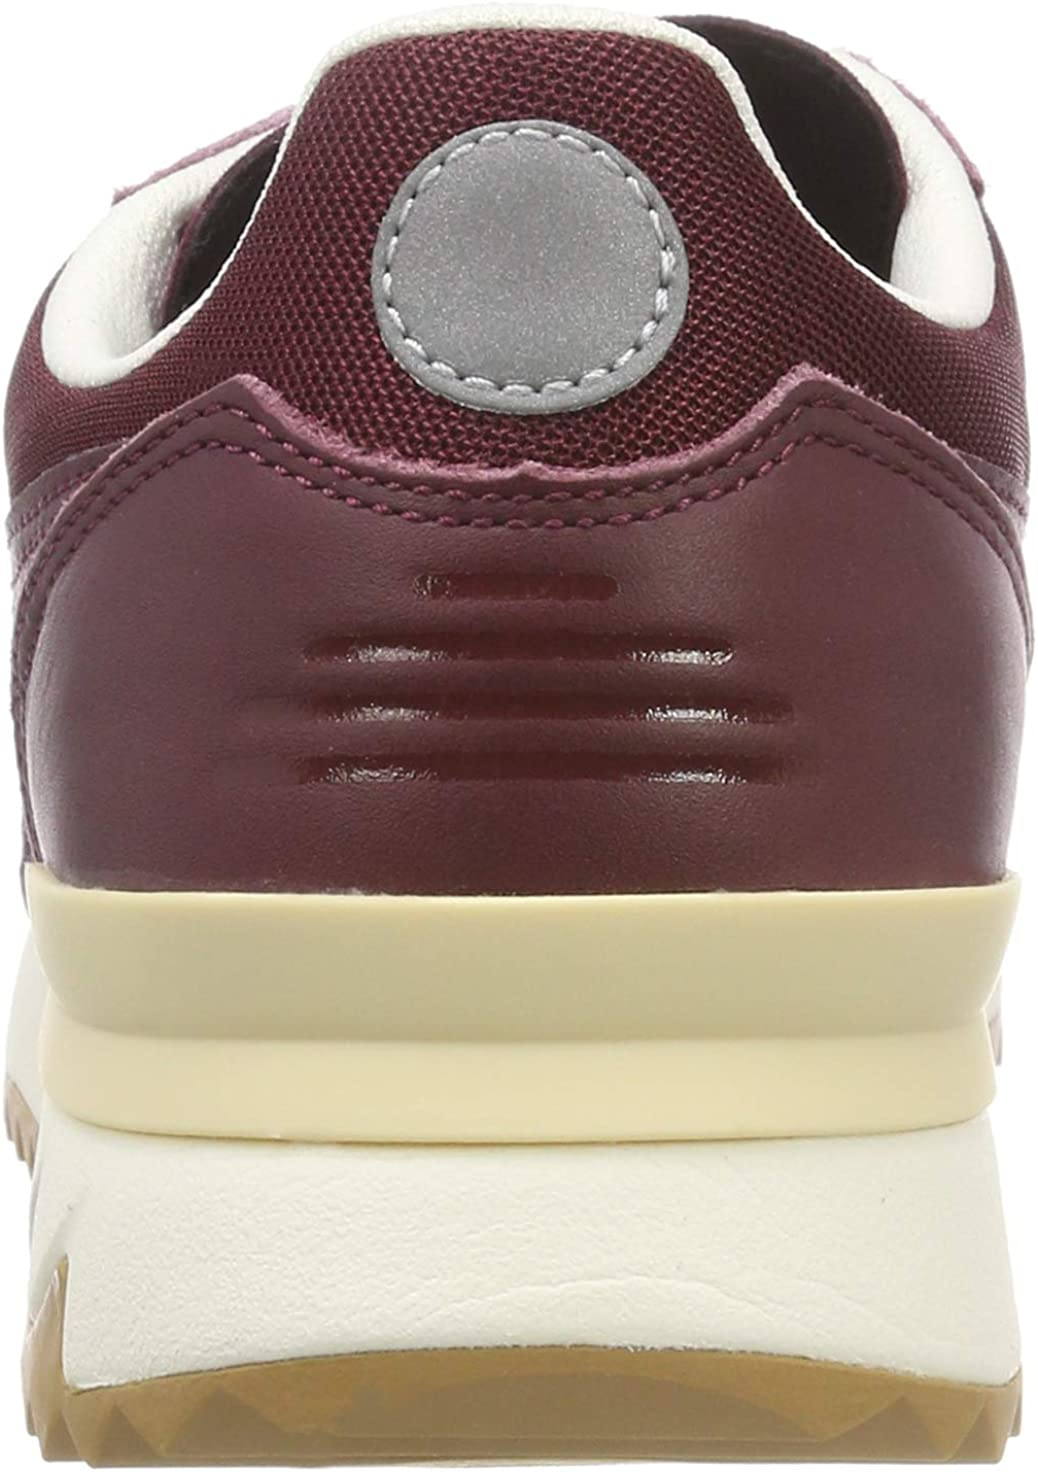 ASICS California 78 Ex, Chaussures de Fitness Mixte Adulte Multicolore Port Royal Port Royal 600